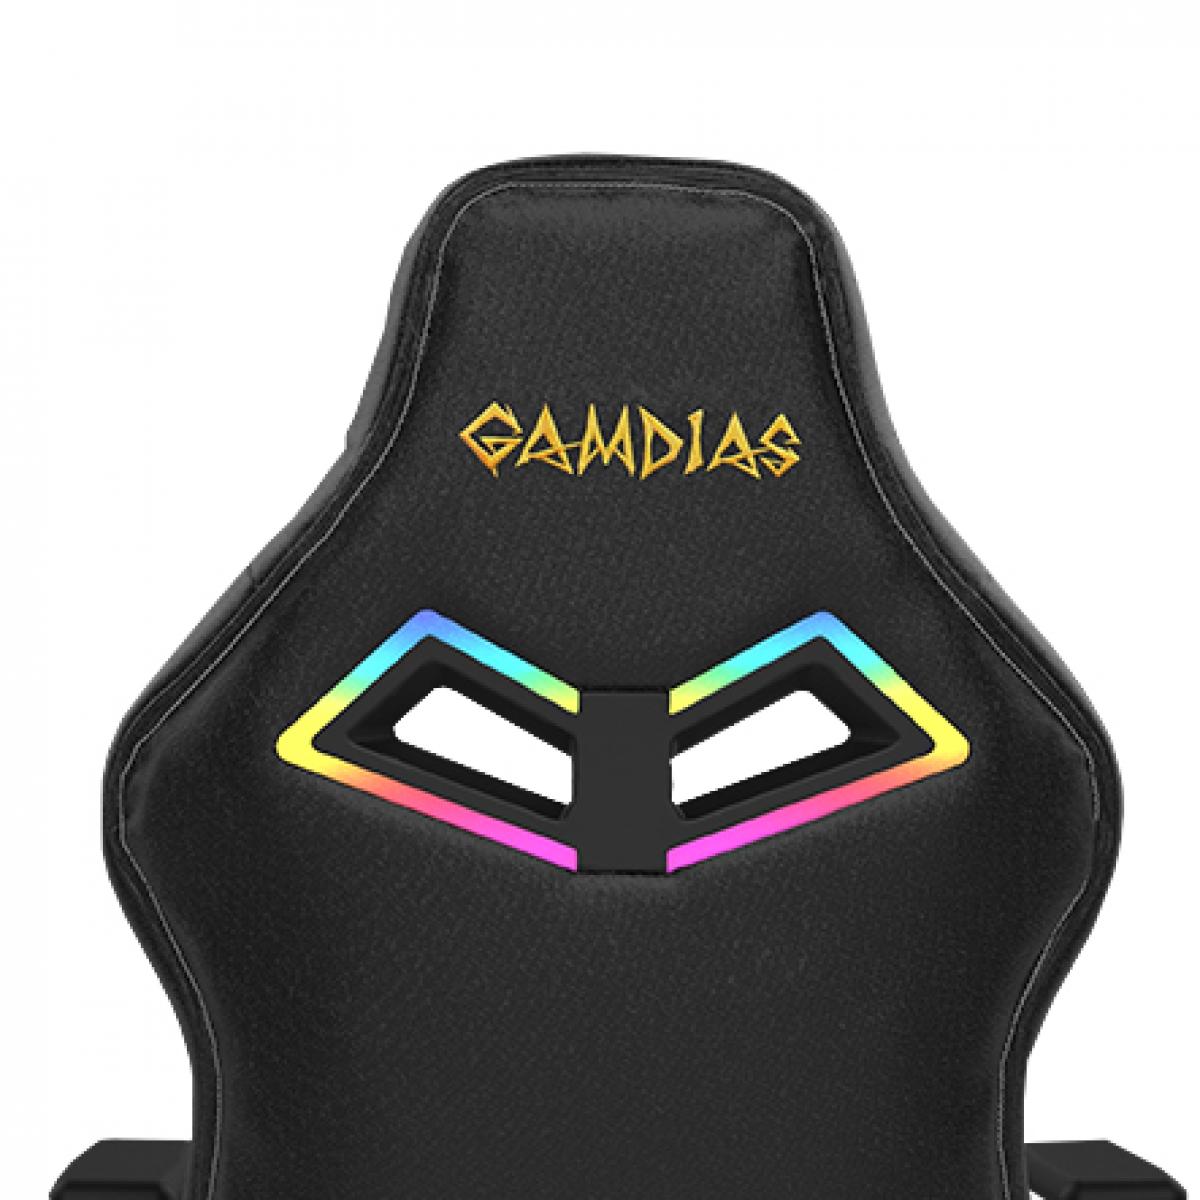 Cadeira Gamer Gamdias Achilles RGB E3 L, Black, GD-ACHILLESE3LB